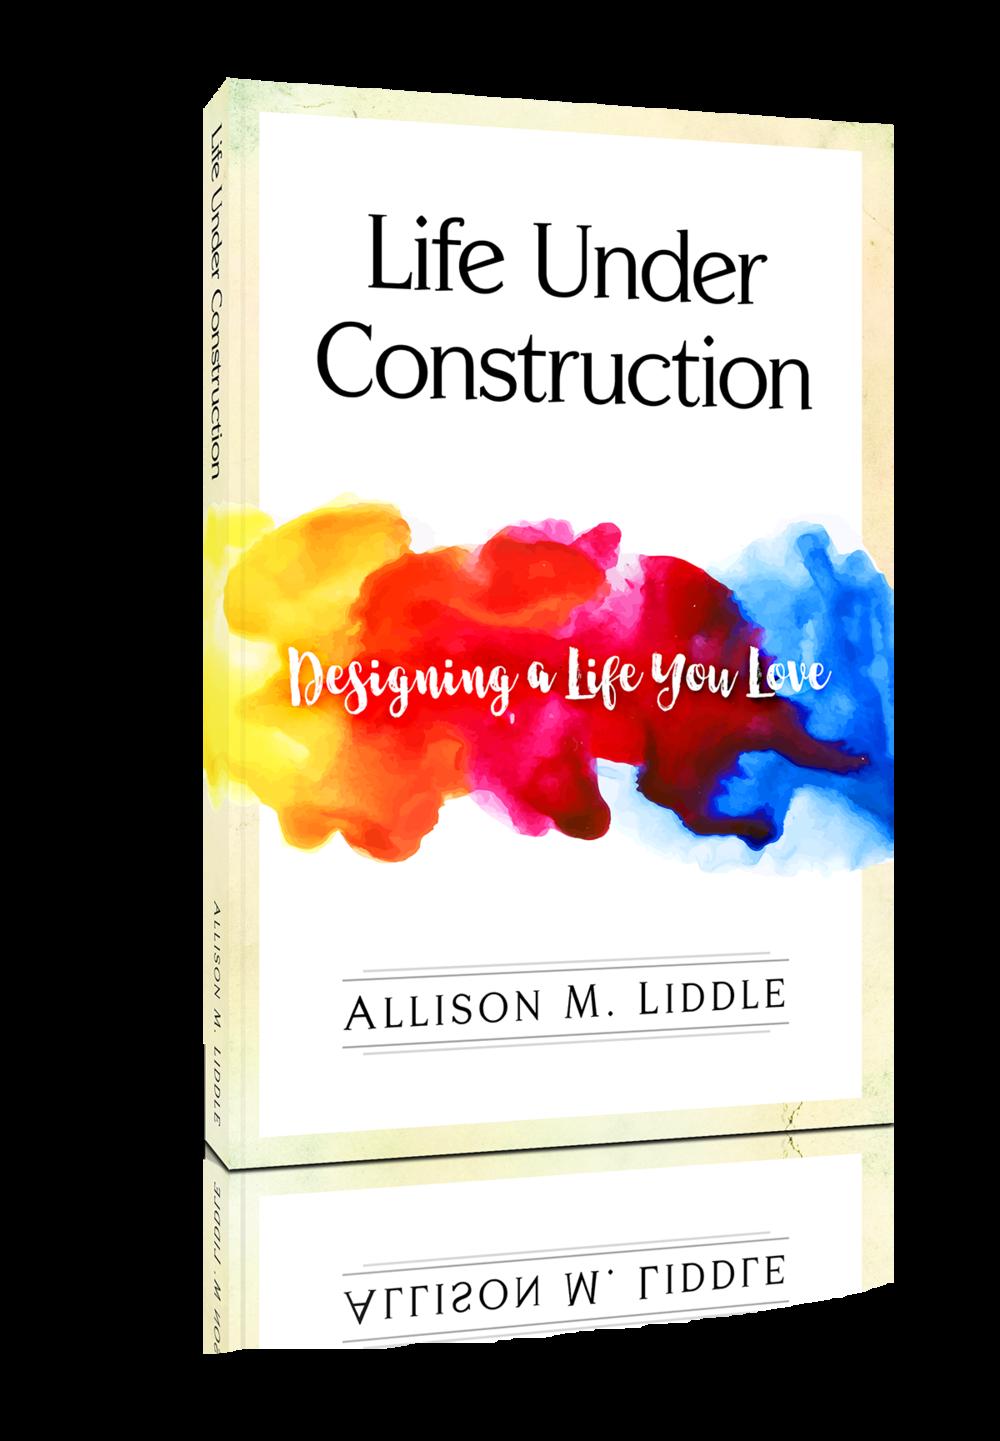 LifeUnderConstruction-3D.png